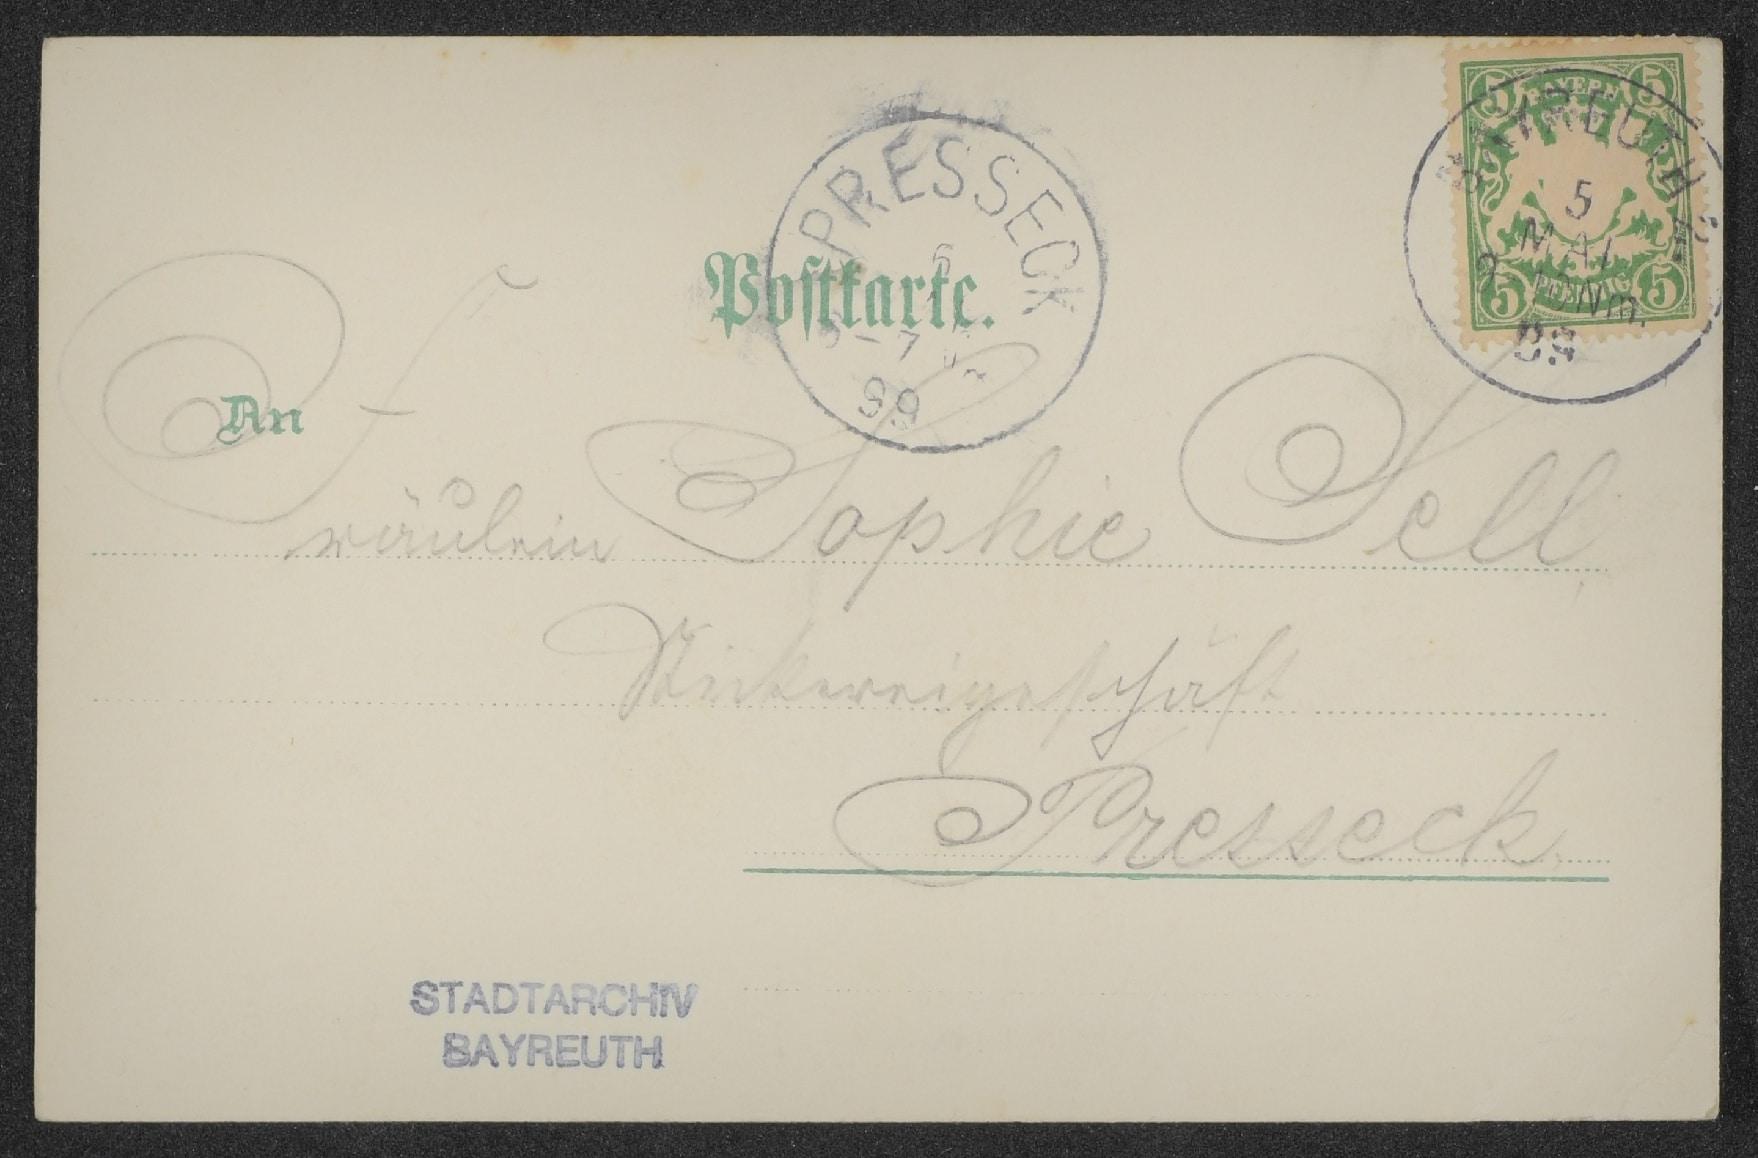 Ansichtskarte aus Bayreuth (Rückseite)